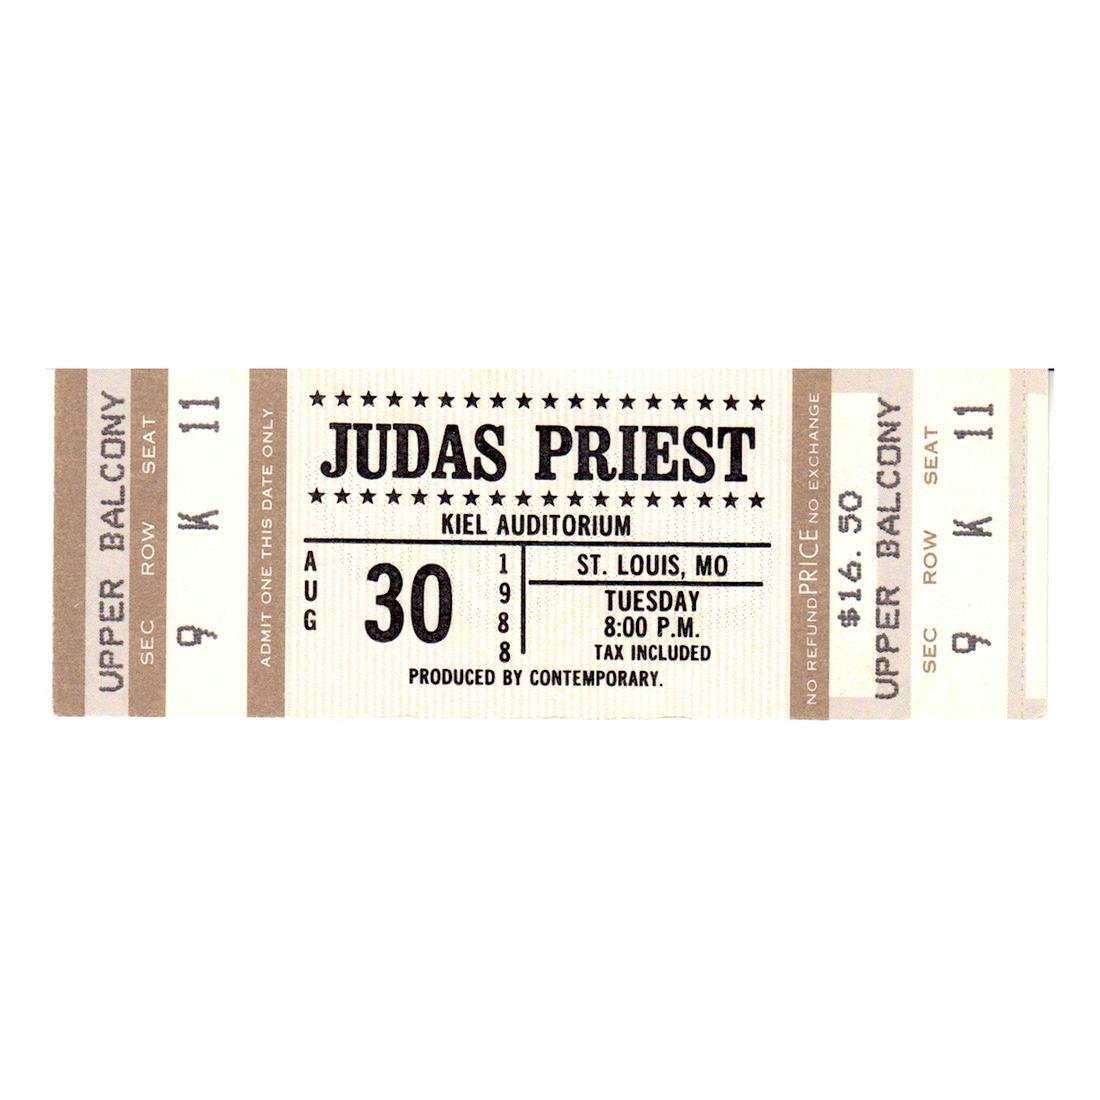 Louis MO Sale JUDAS PRIEST 1988 Vintage Unused Concert Tour Ticket Kiel Auditorium St